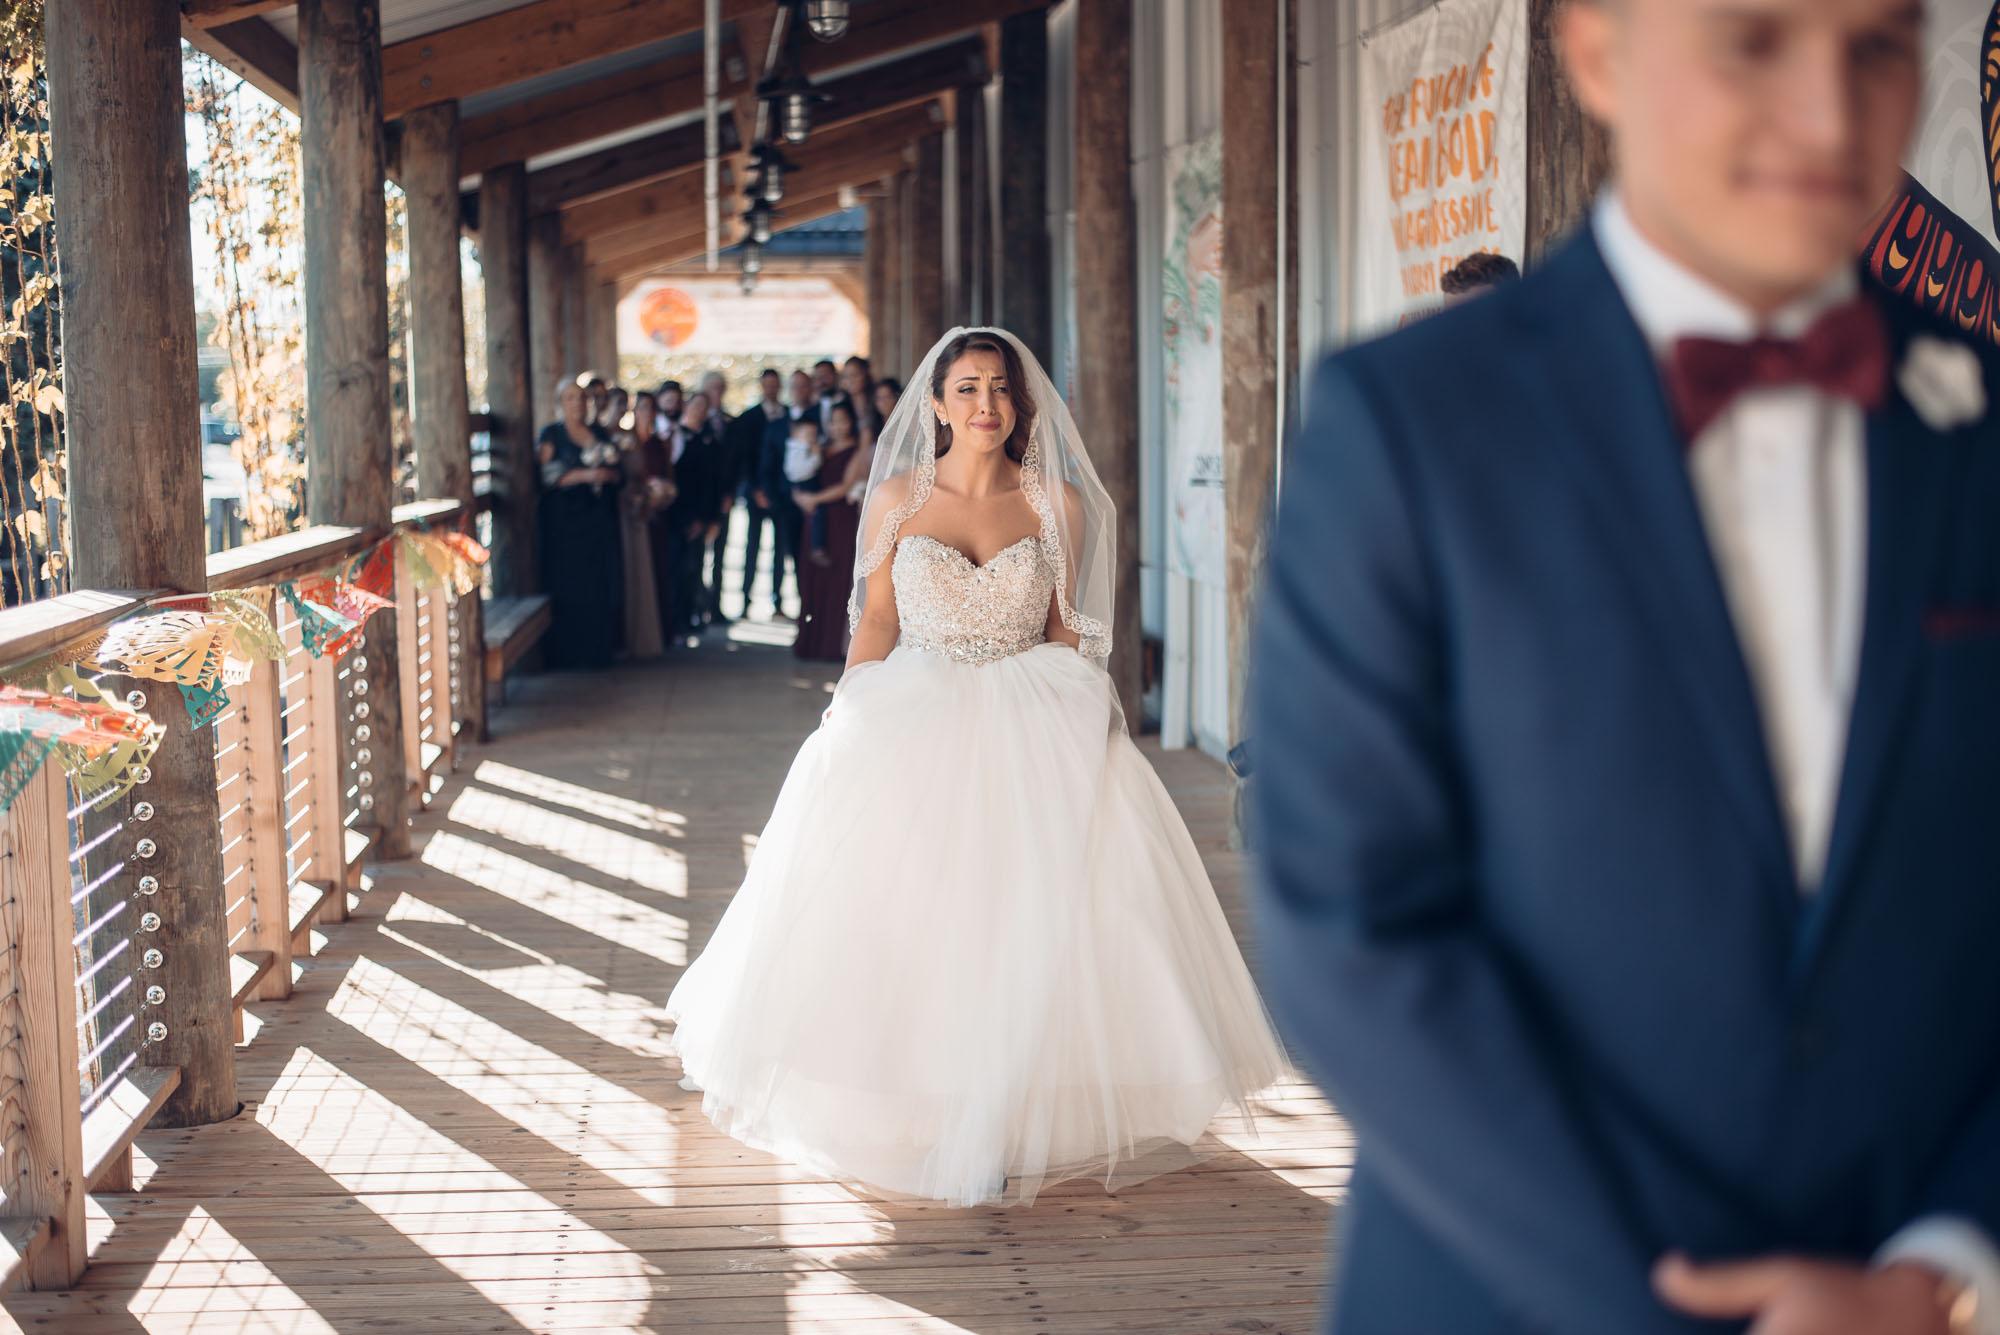 woodwinds_wedding_171020_web-22.jpg